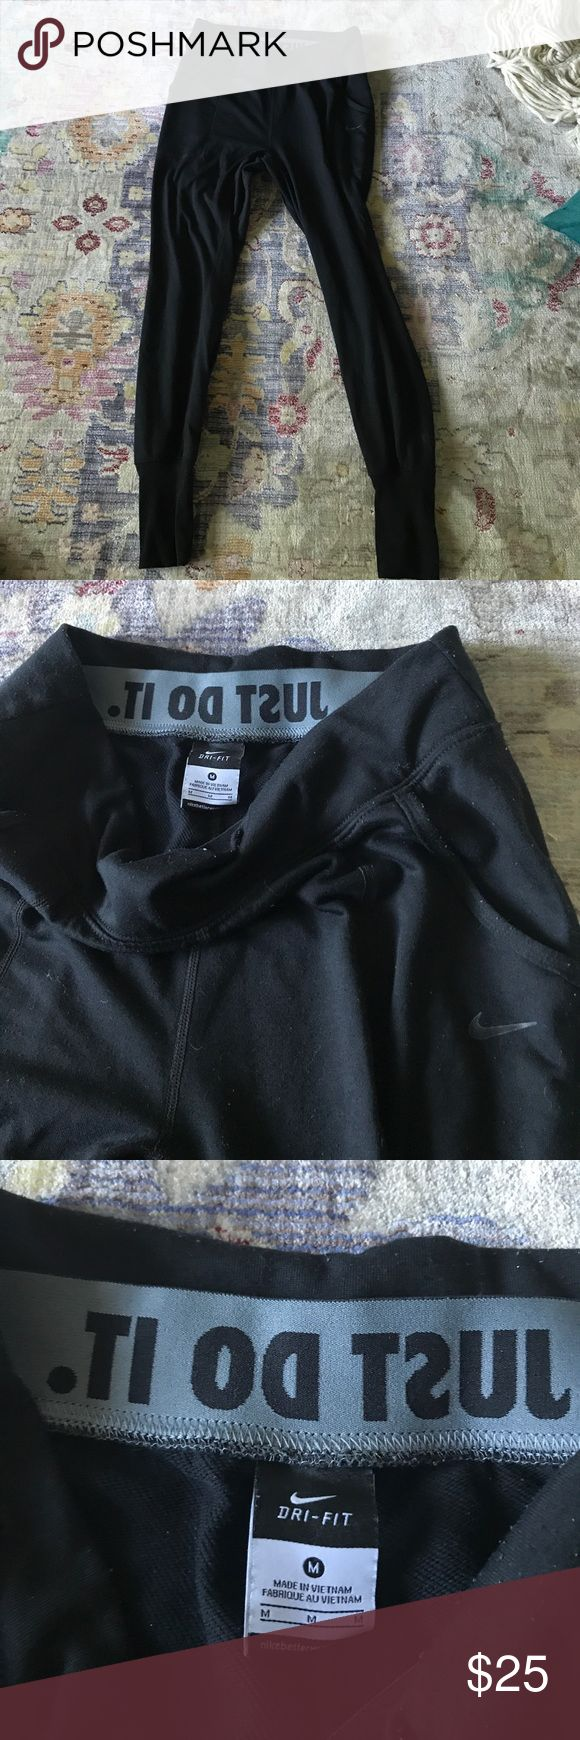 Mens Nike jogger sweatpants Mens Nike jogger sweatpants in great condition Nike Pants Sweatpants & Joggers